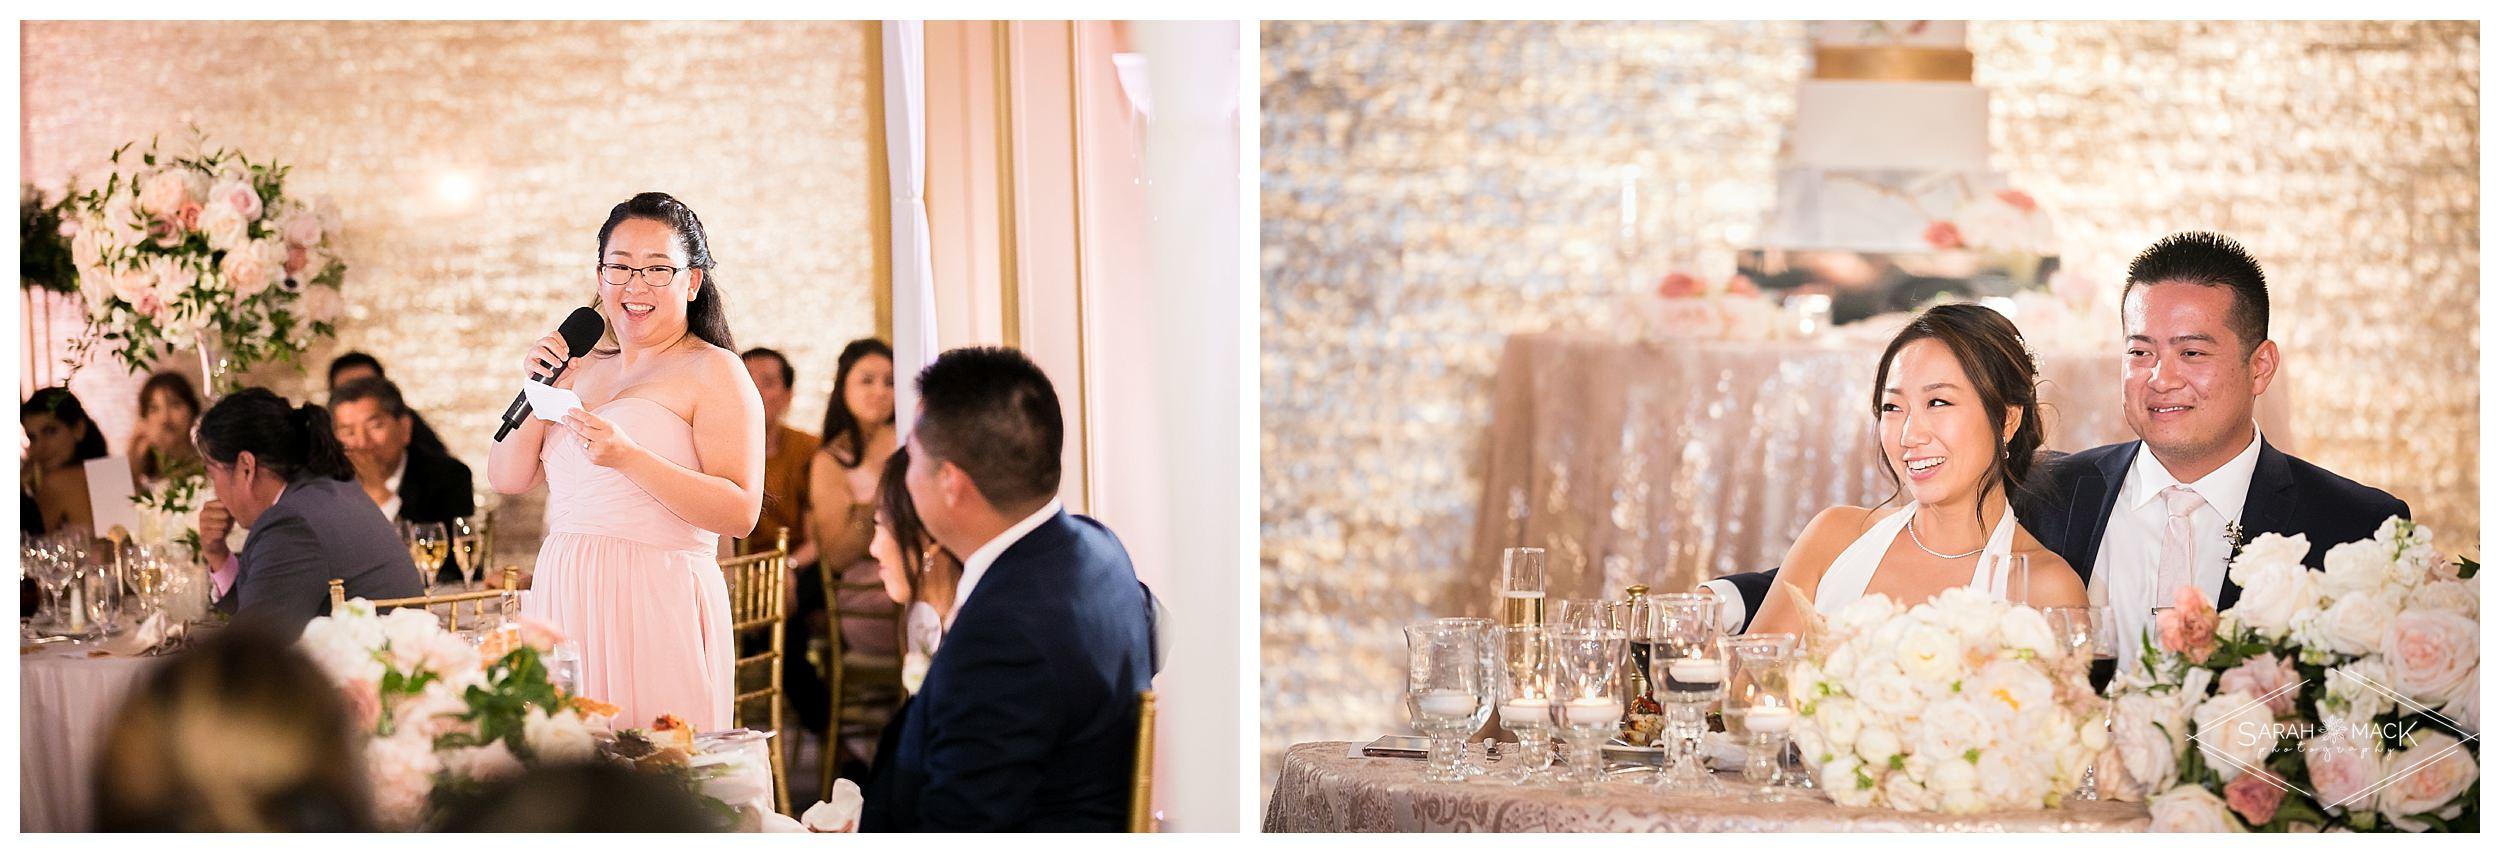 CJ-Ritz-Carlton-Laguna-Beach-Wedding-Photography-0242.jpg